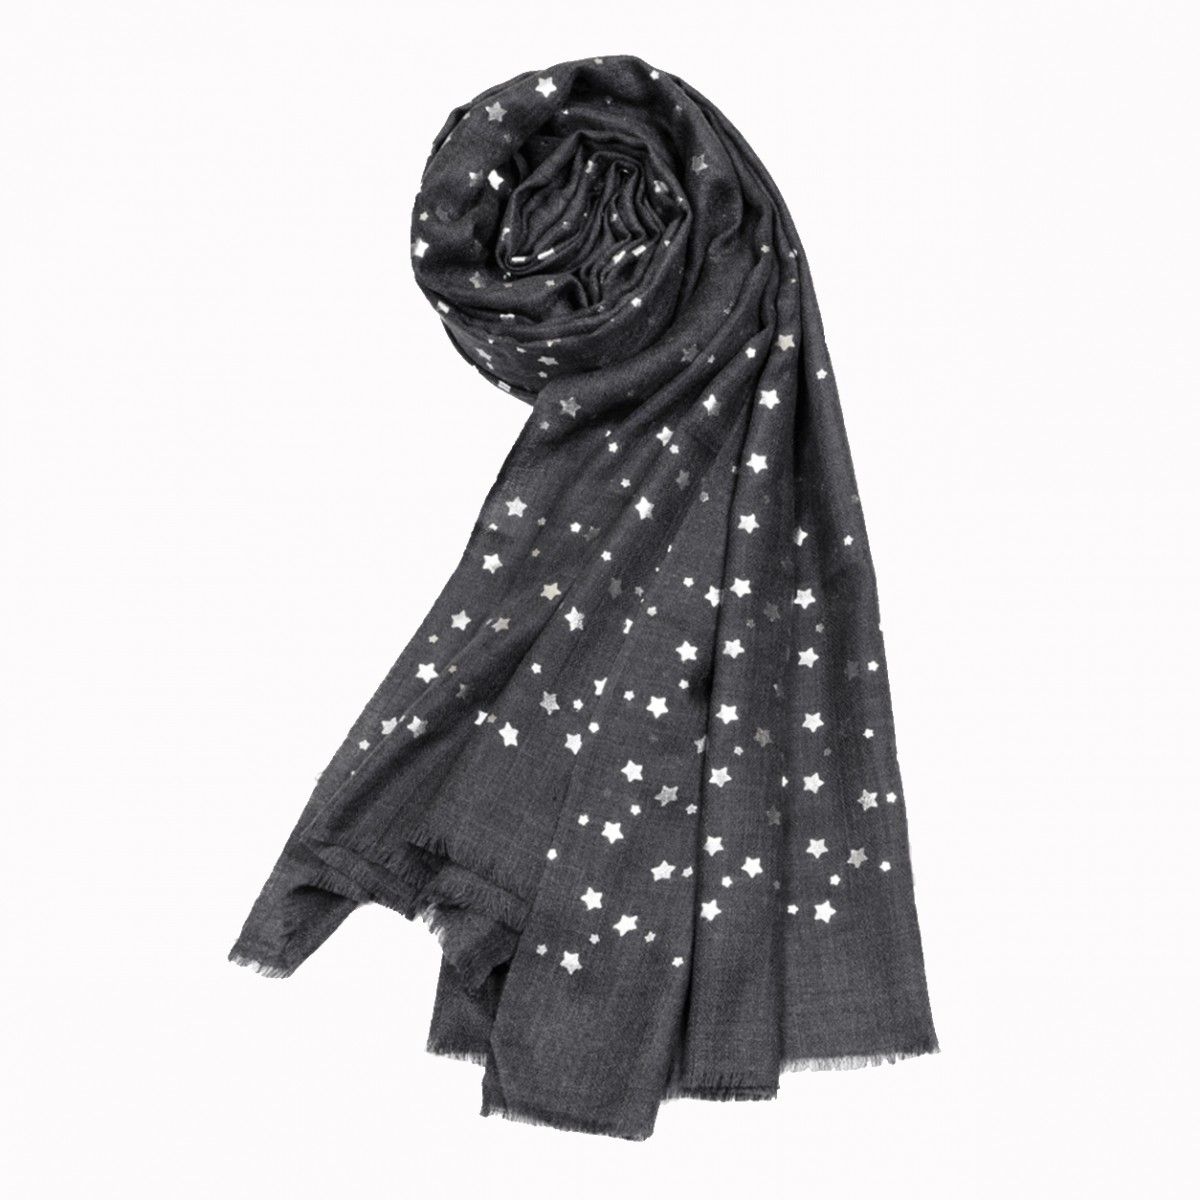 Agent grey star merino wool shawl